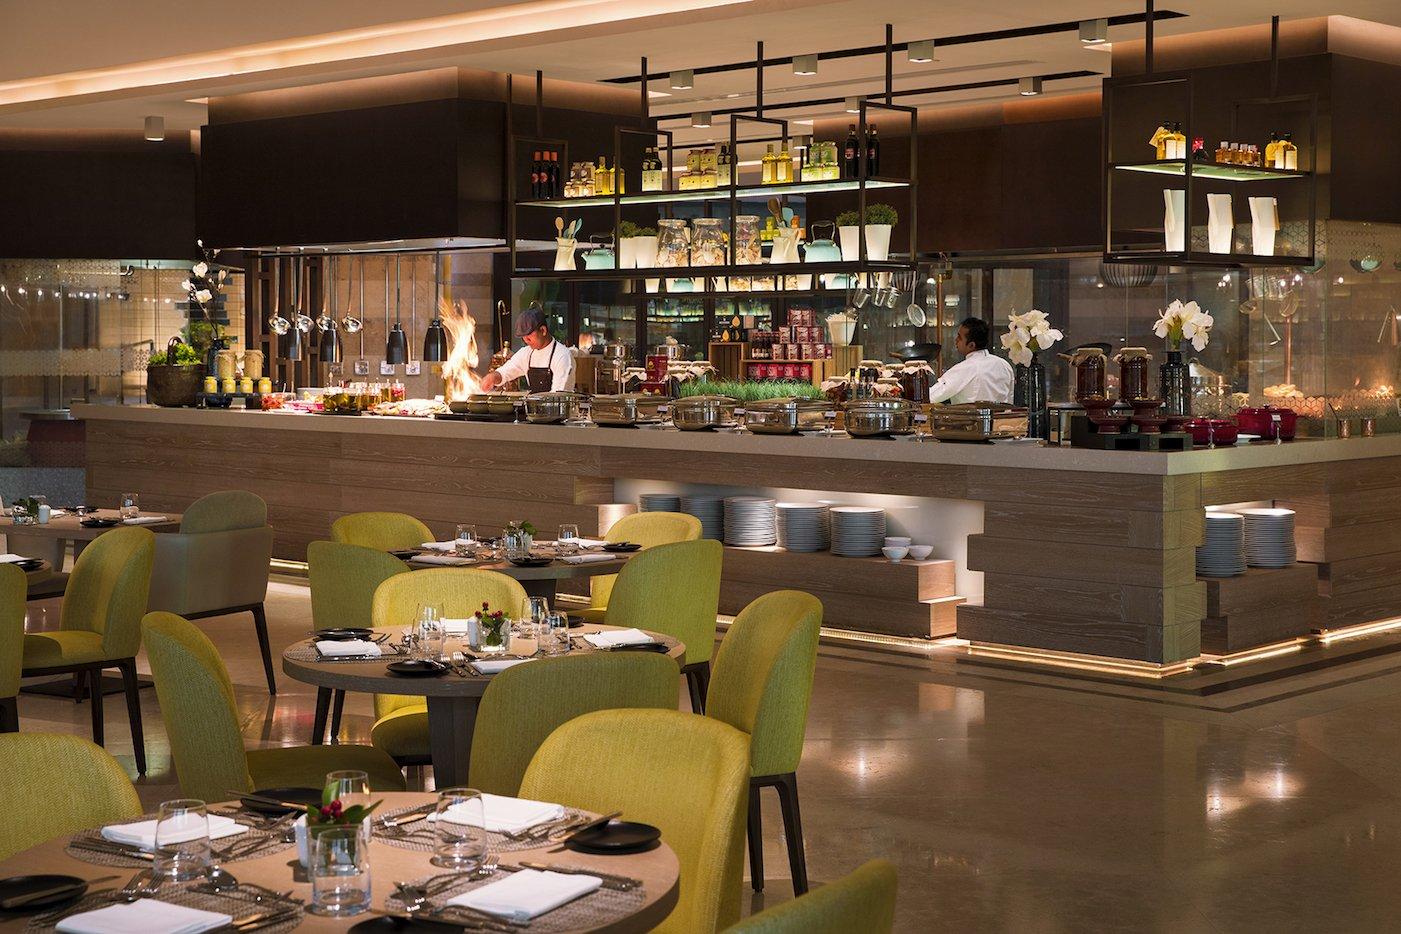 Rotana Saadiyat Resort & Villas Takes Brunch To Next Level With Their New Friday Market Brunch